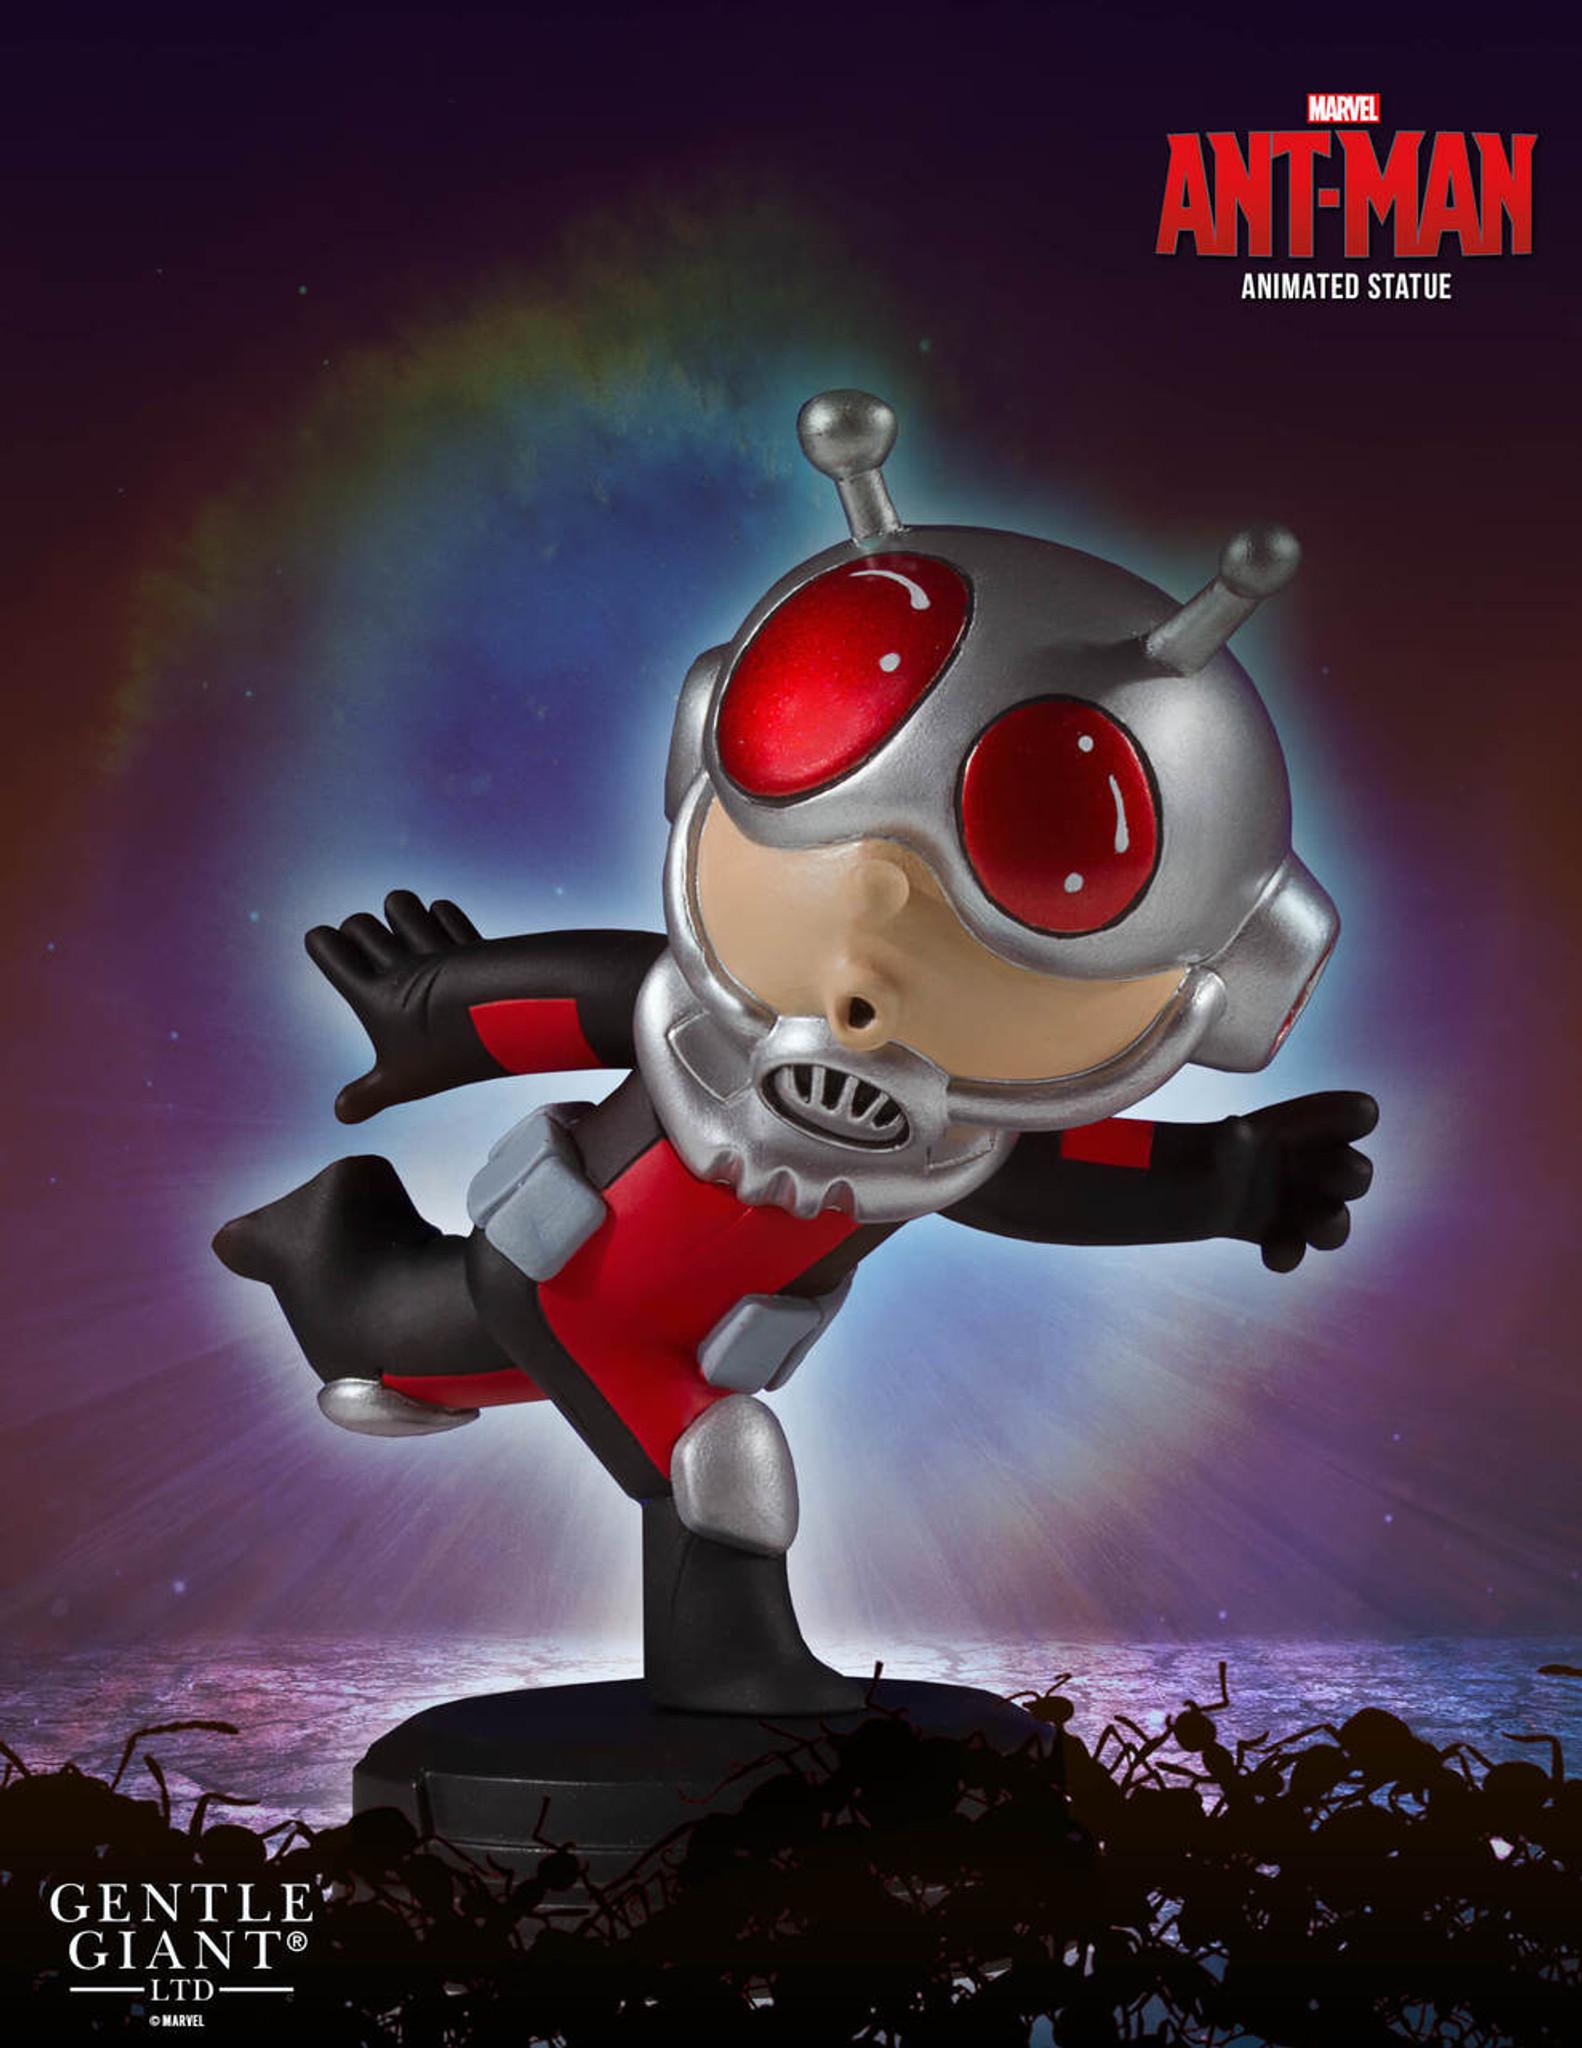 ant man marvel animated statue gentle giant ltd